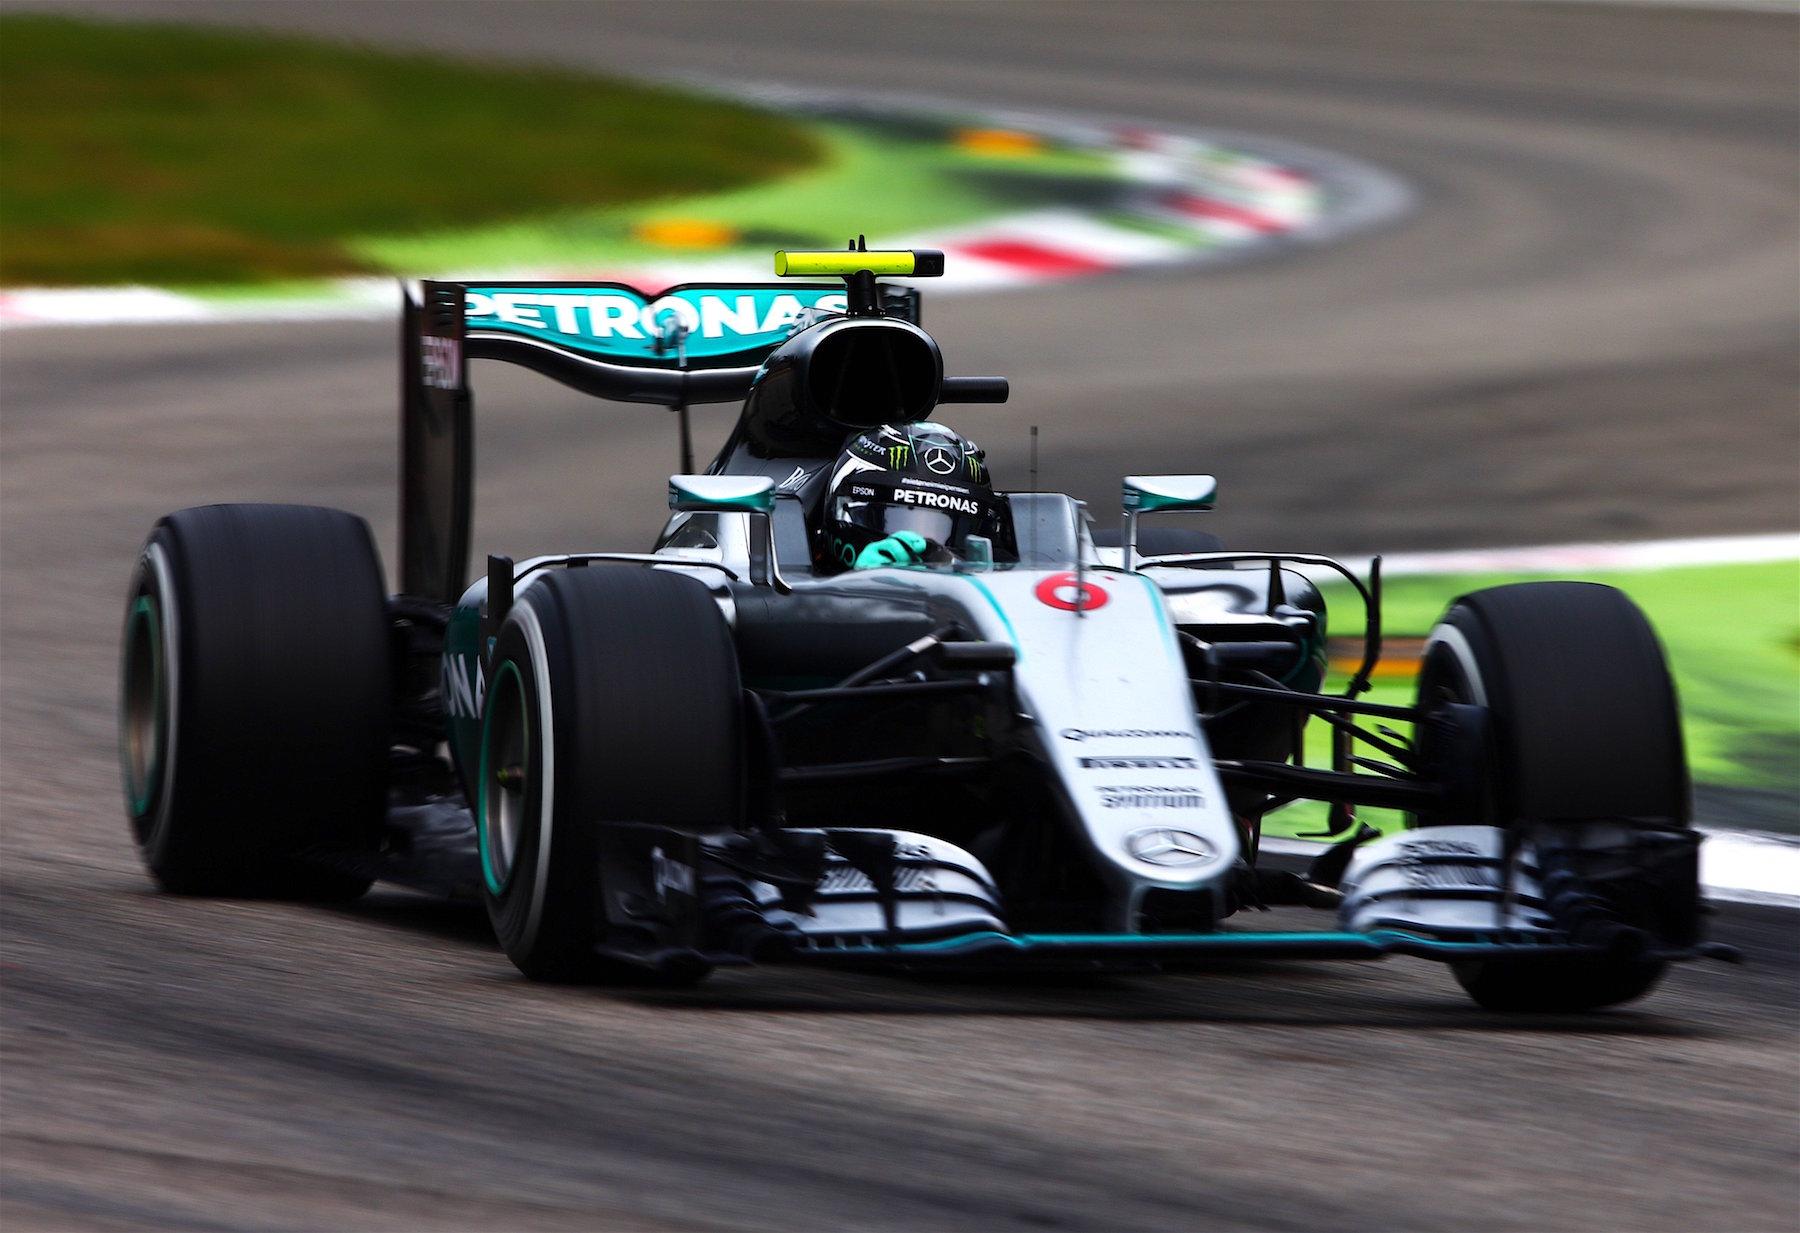 🇮🇹 Italian Grand Prix winner: 🇩🇪 Nico Rosberg